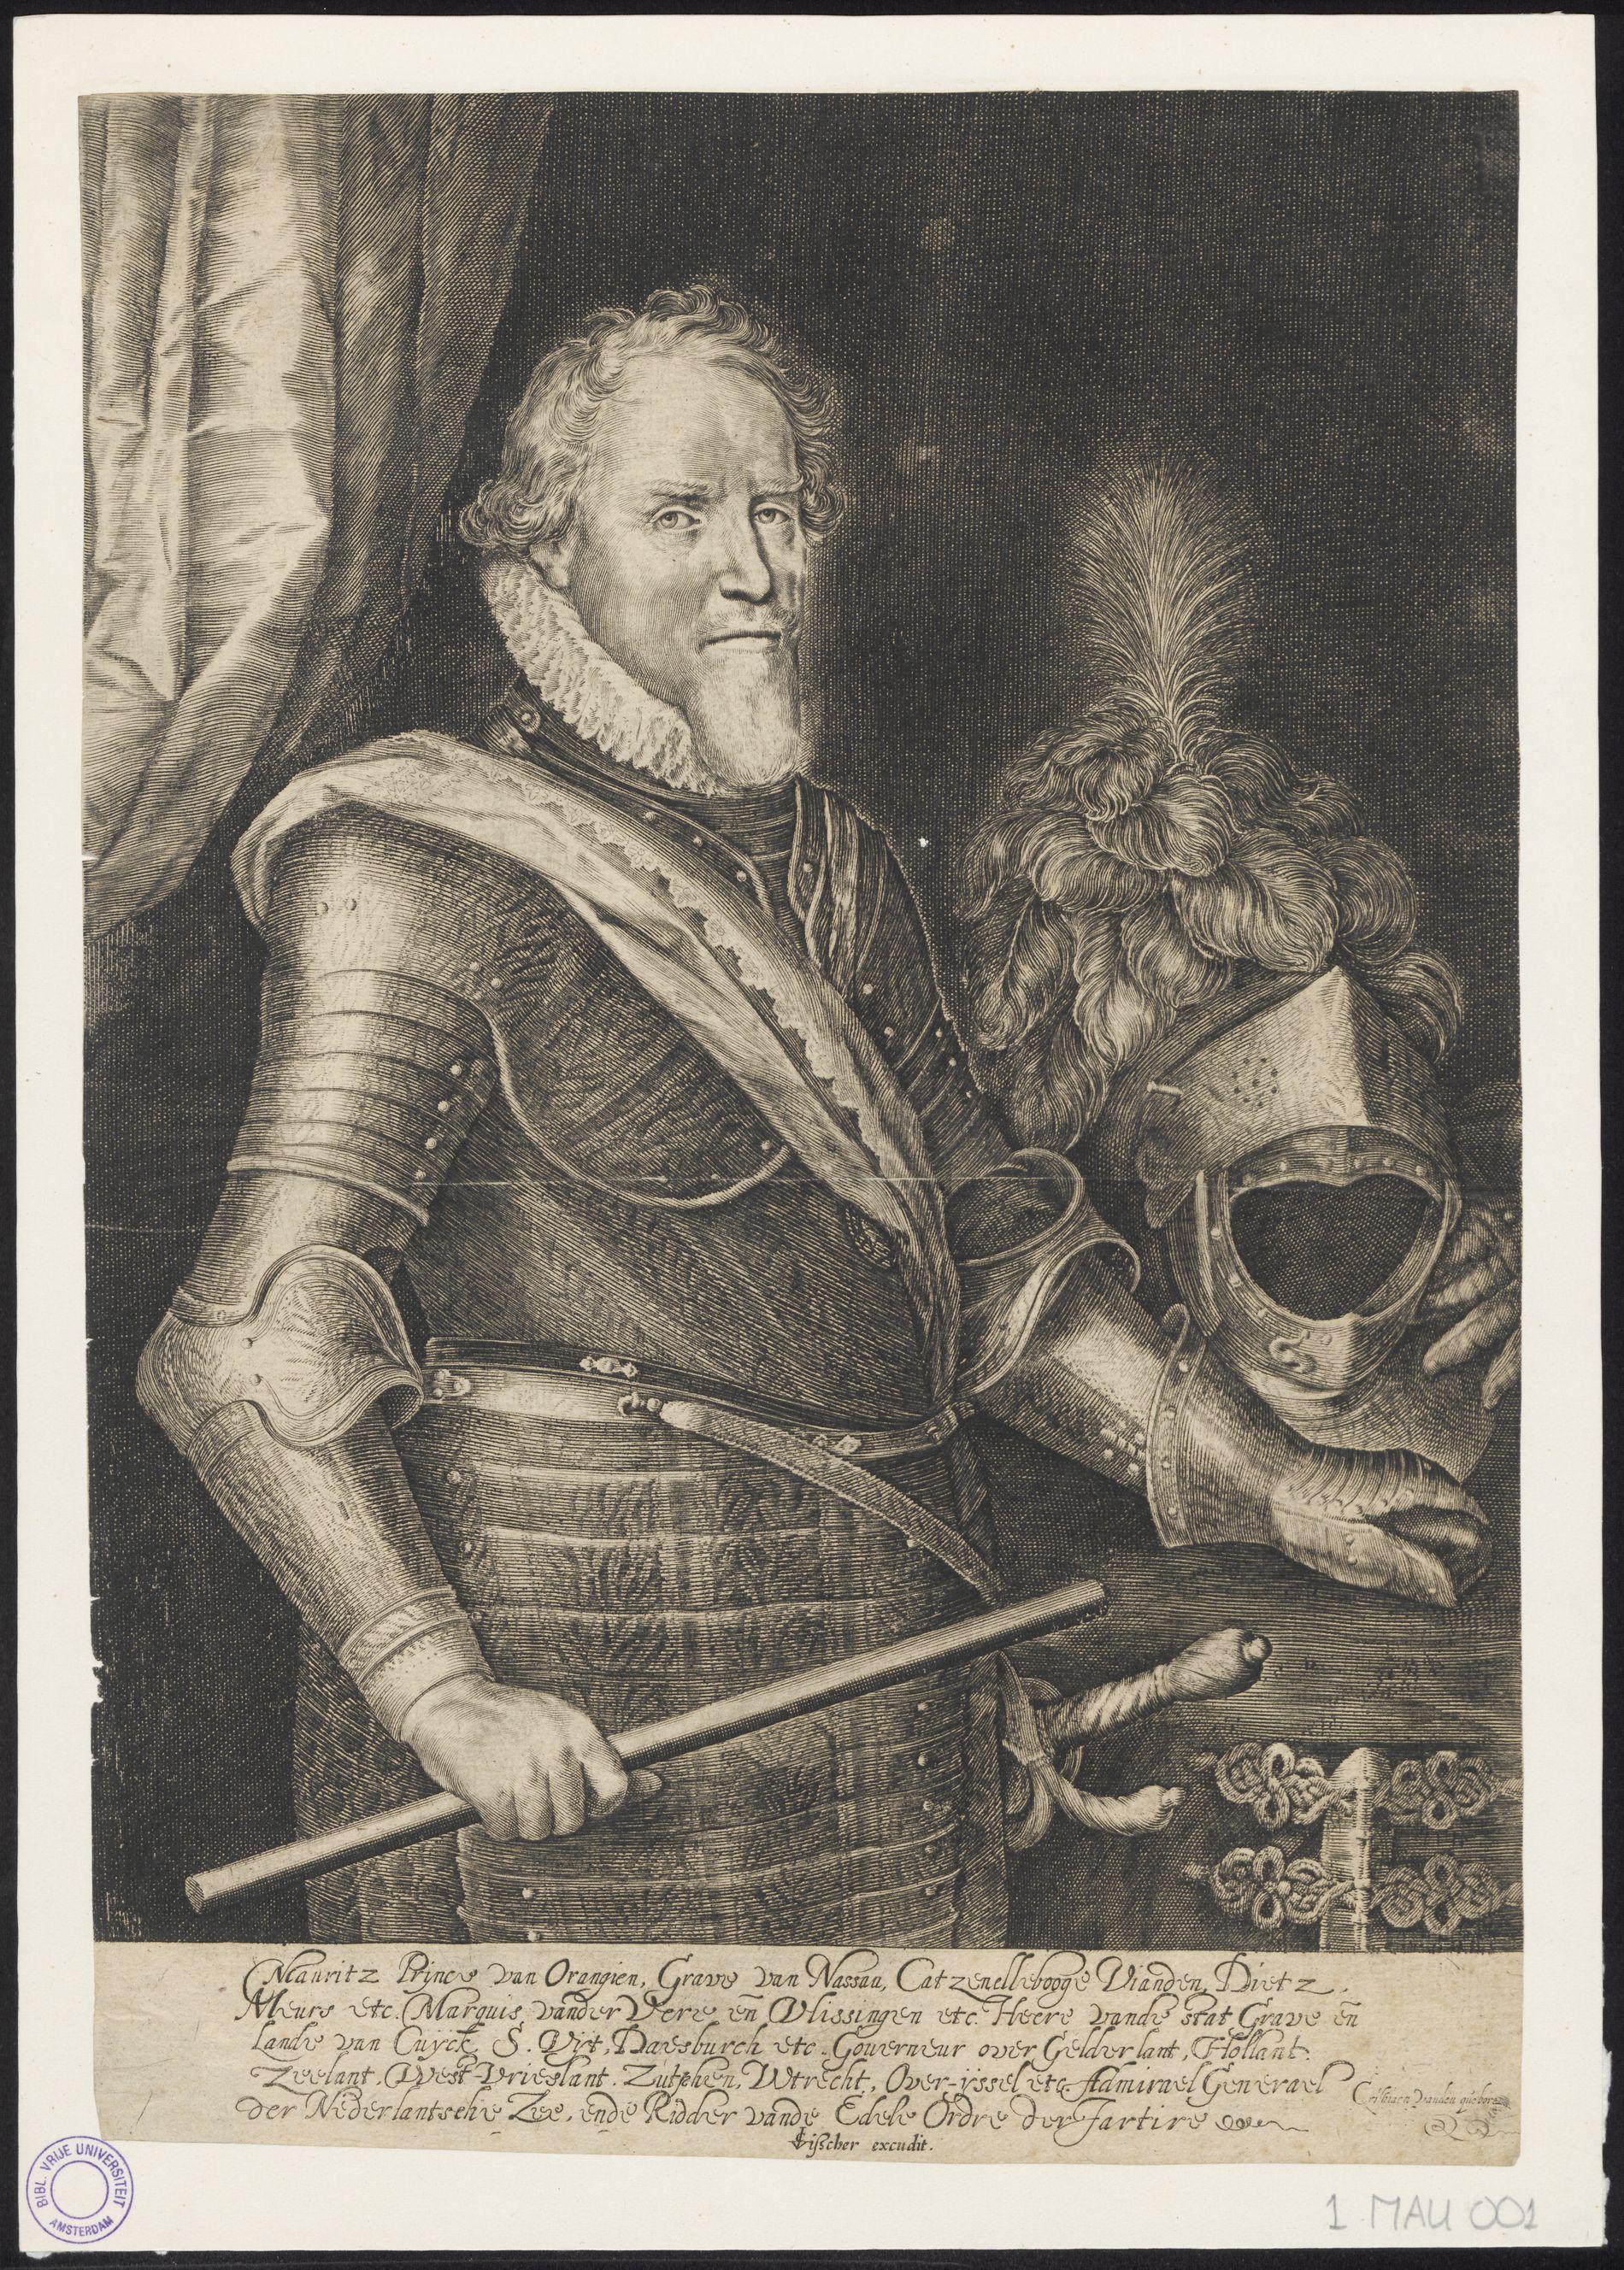 Órániai Móric, Museum Catharijneconvent en Vrije Universiteit, Amsterdam, PORTRET 1 MAU 001